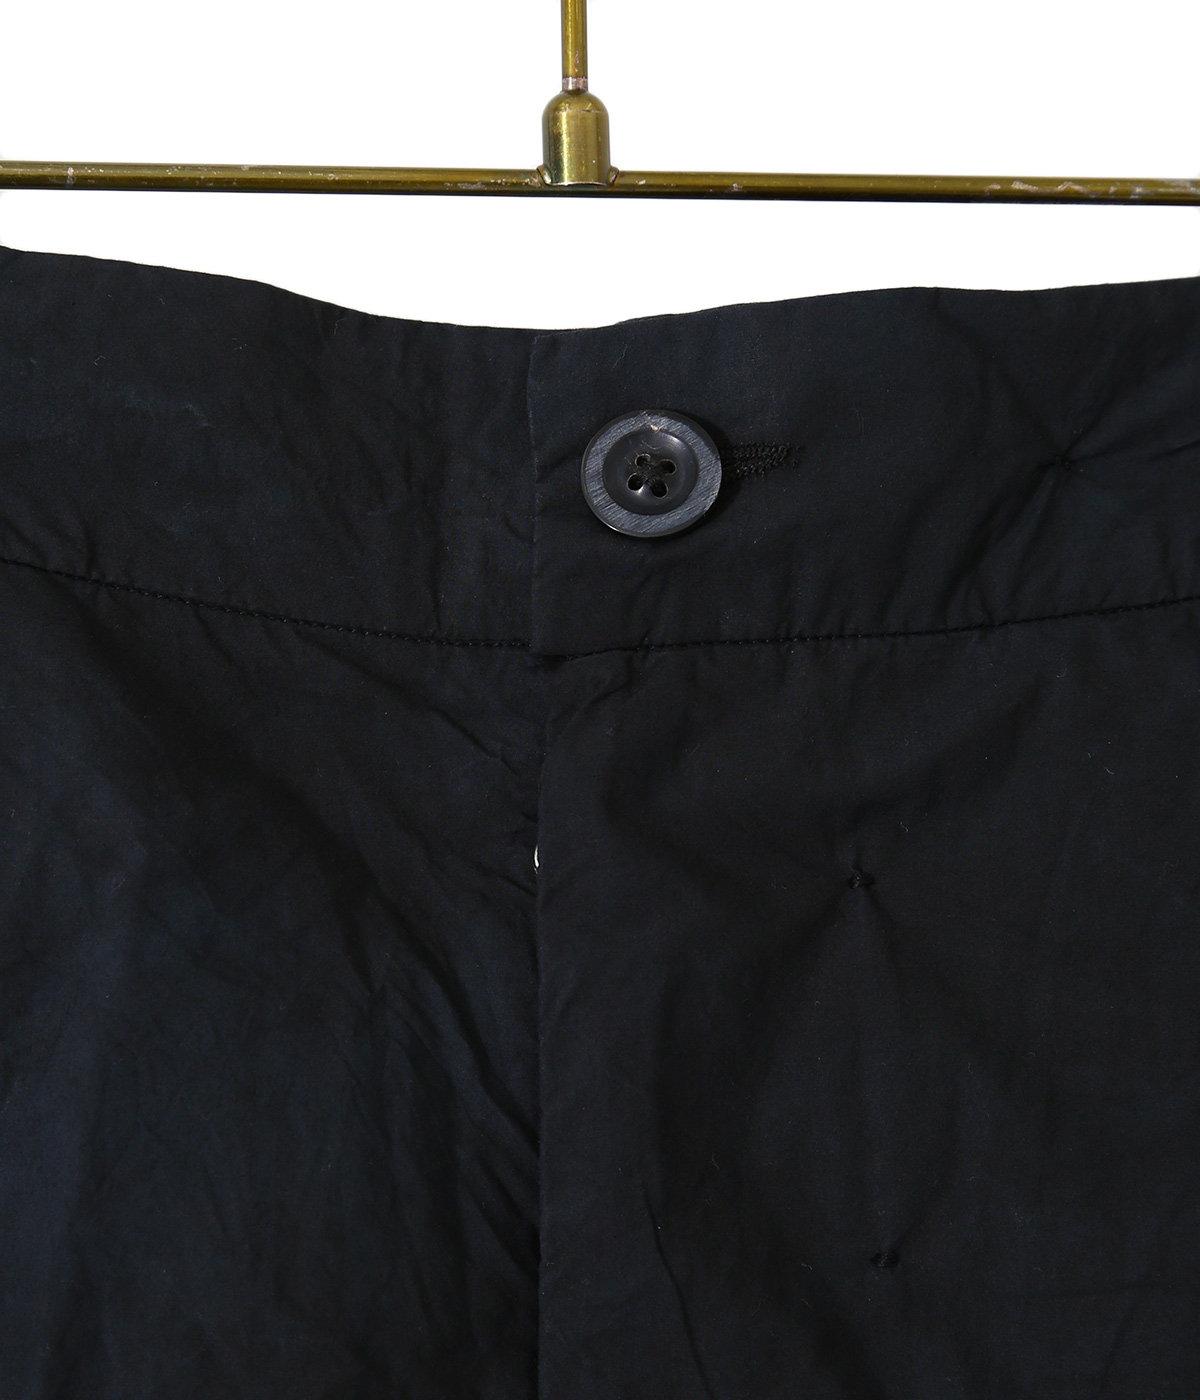 Lightweight short with detachable bag pocket